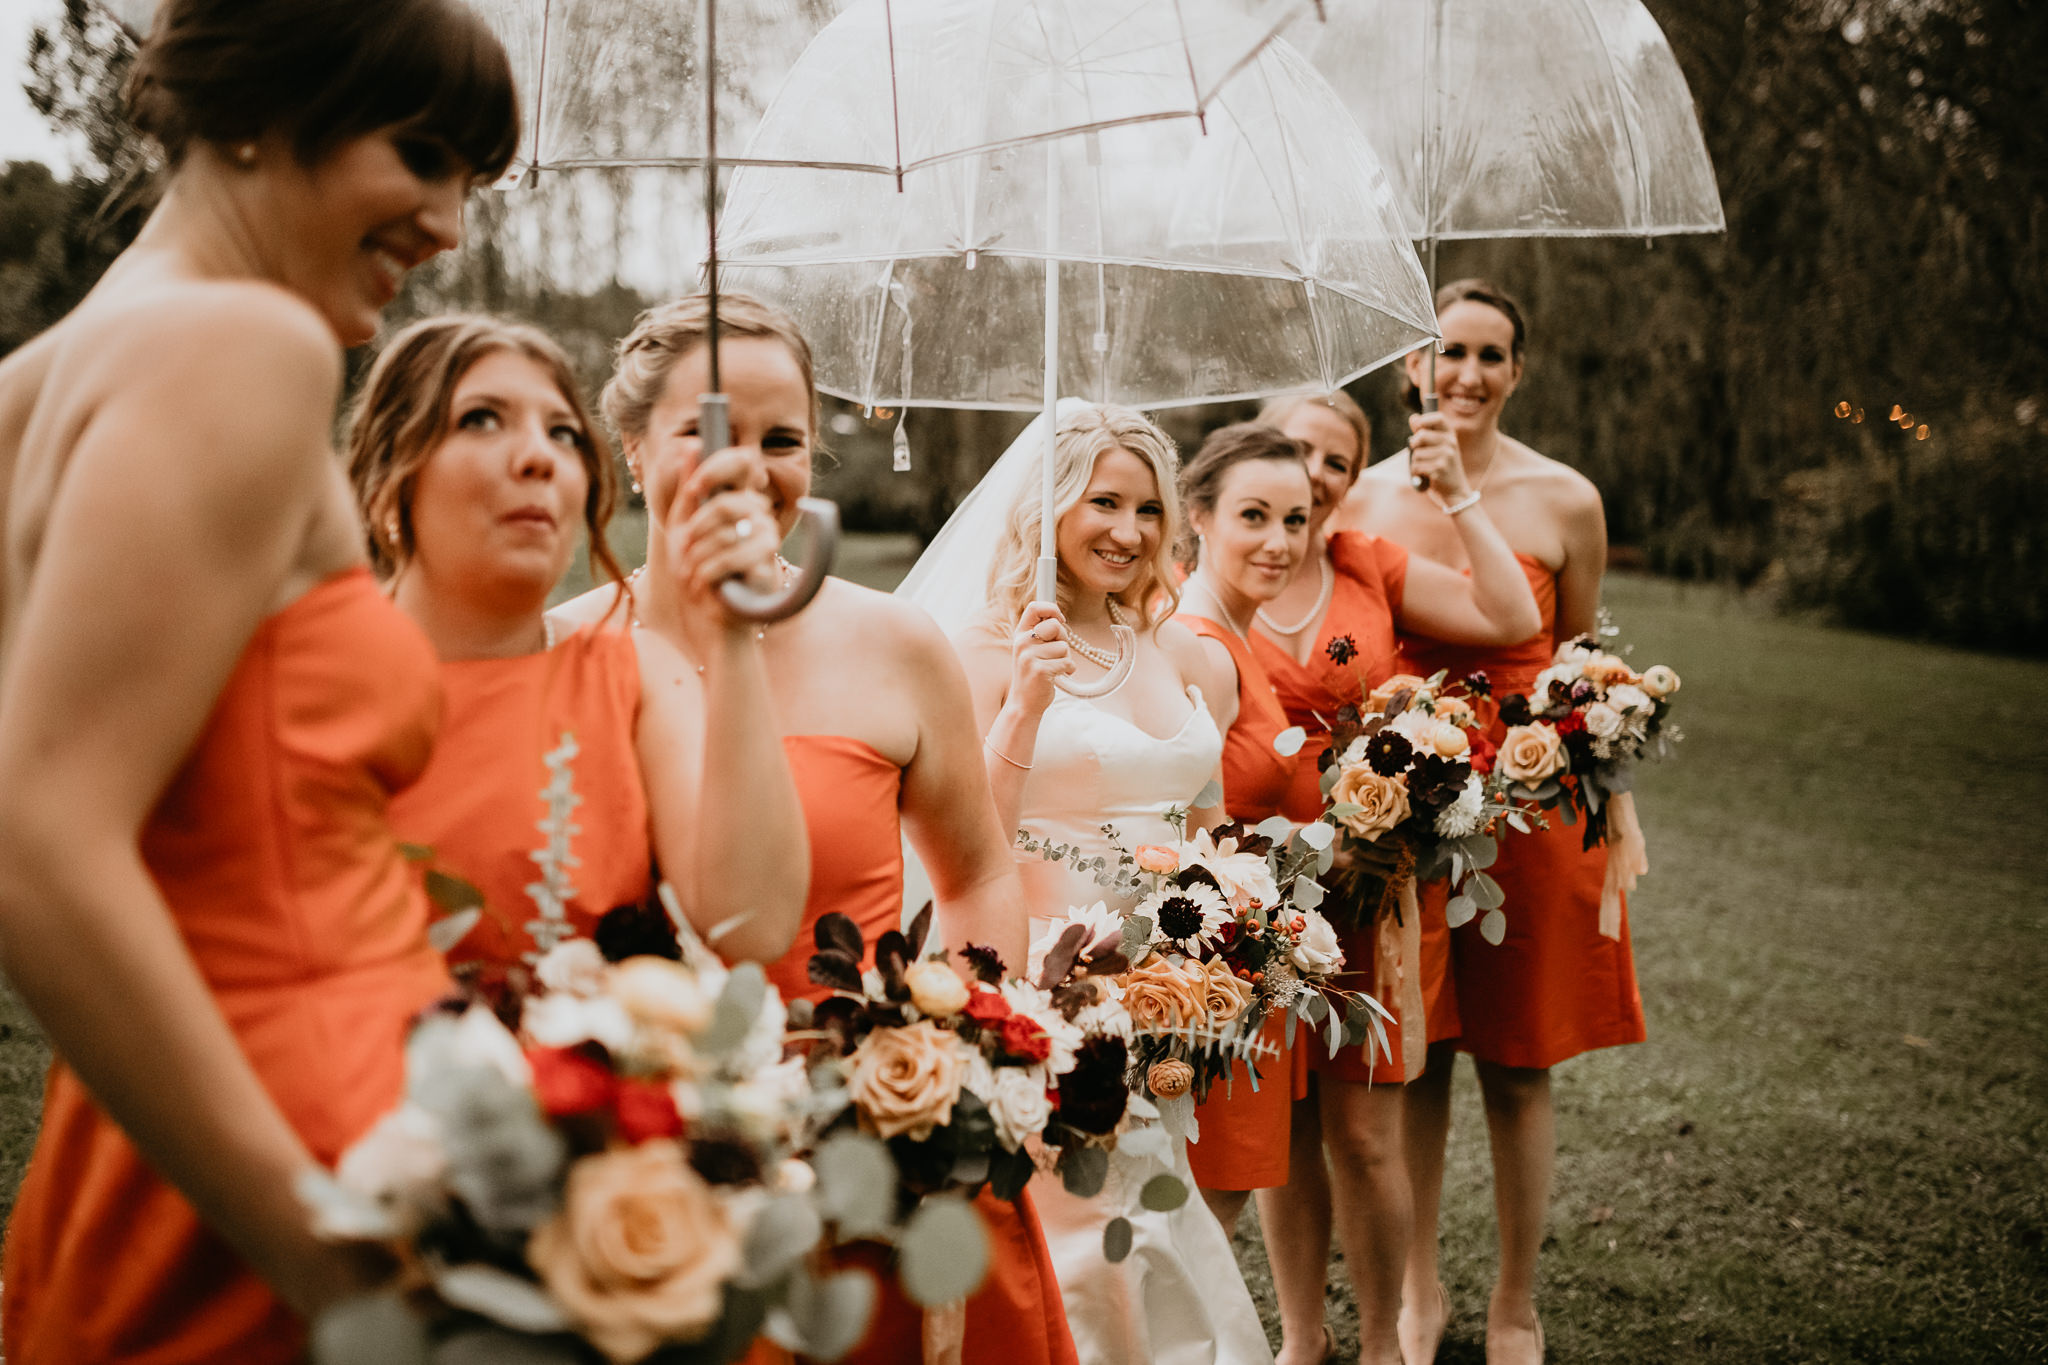 Sundara - Weddings - Virginia - Best Wedding Photographer - Pat Cori Photography-69.jpg